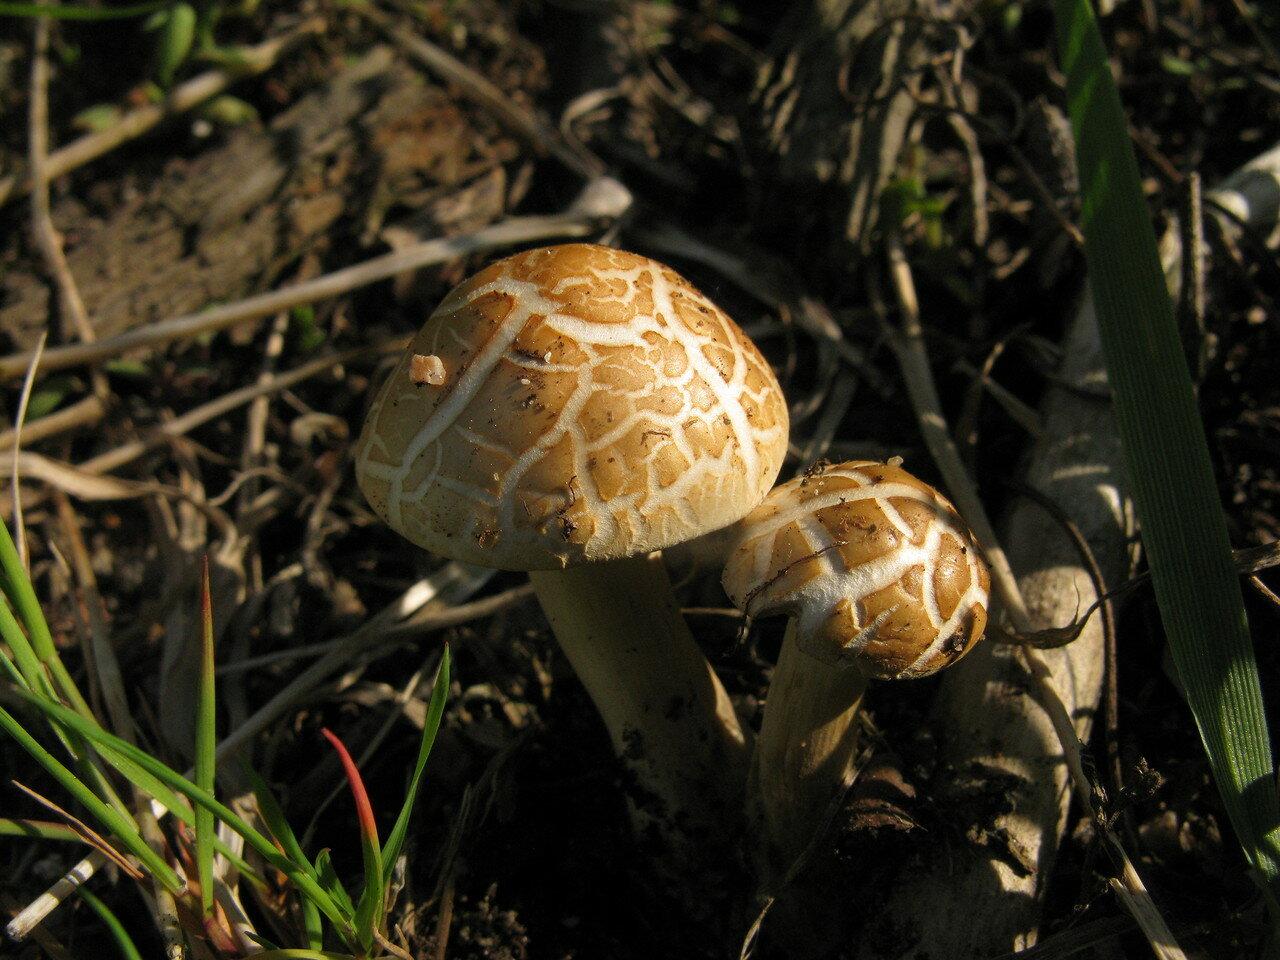 Чешуйчатка ранняя (Agrocybe praecox). Автор фото: Станислав Кривошеев